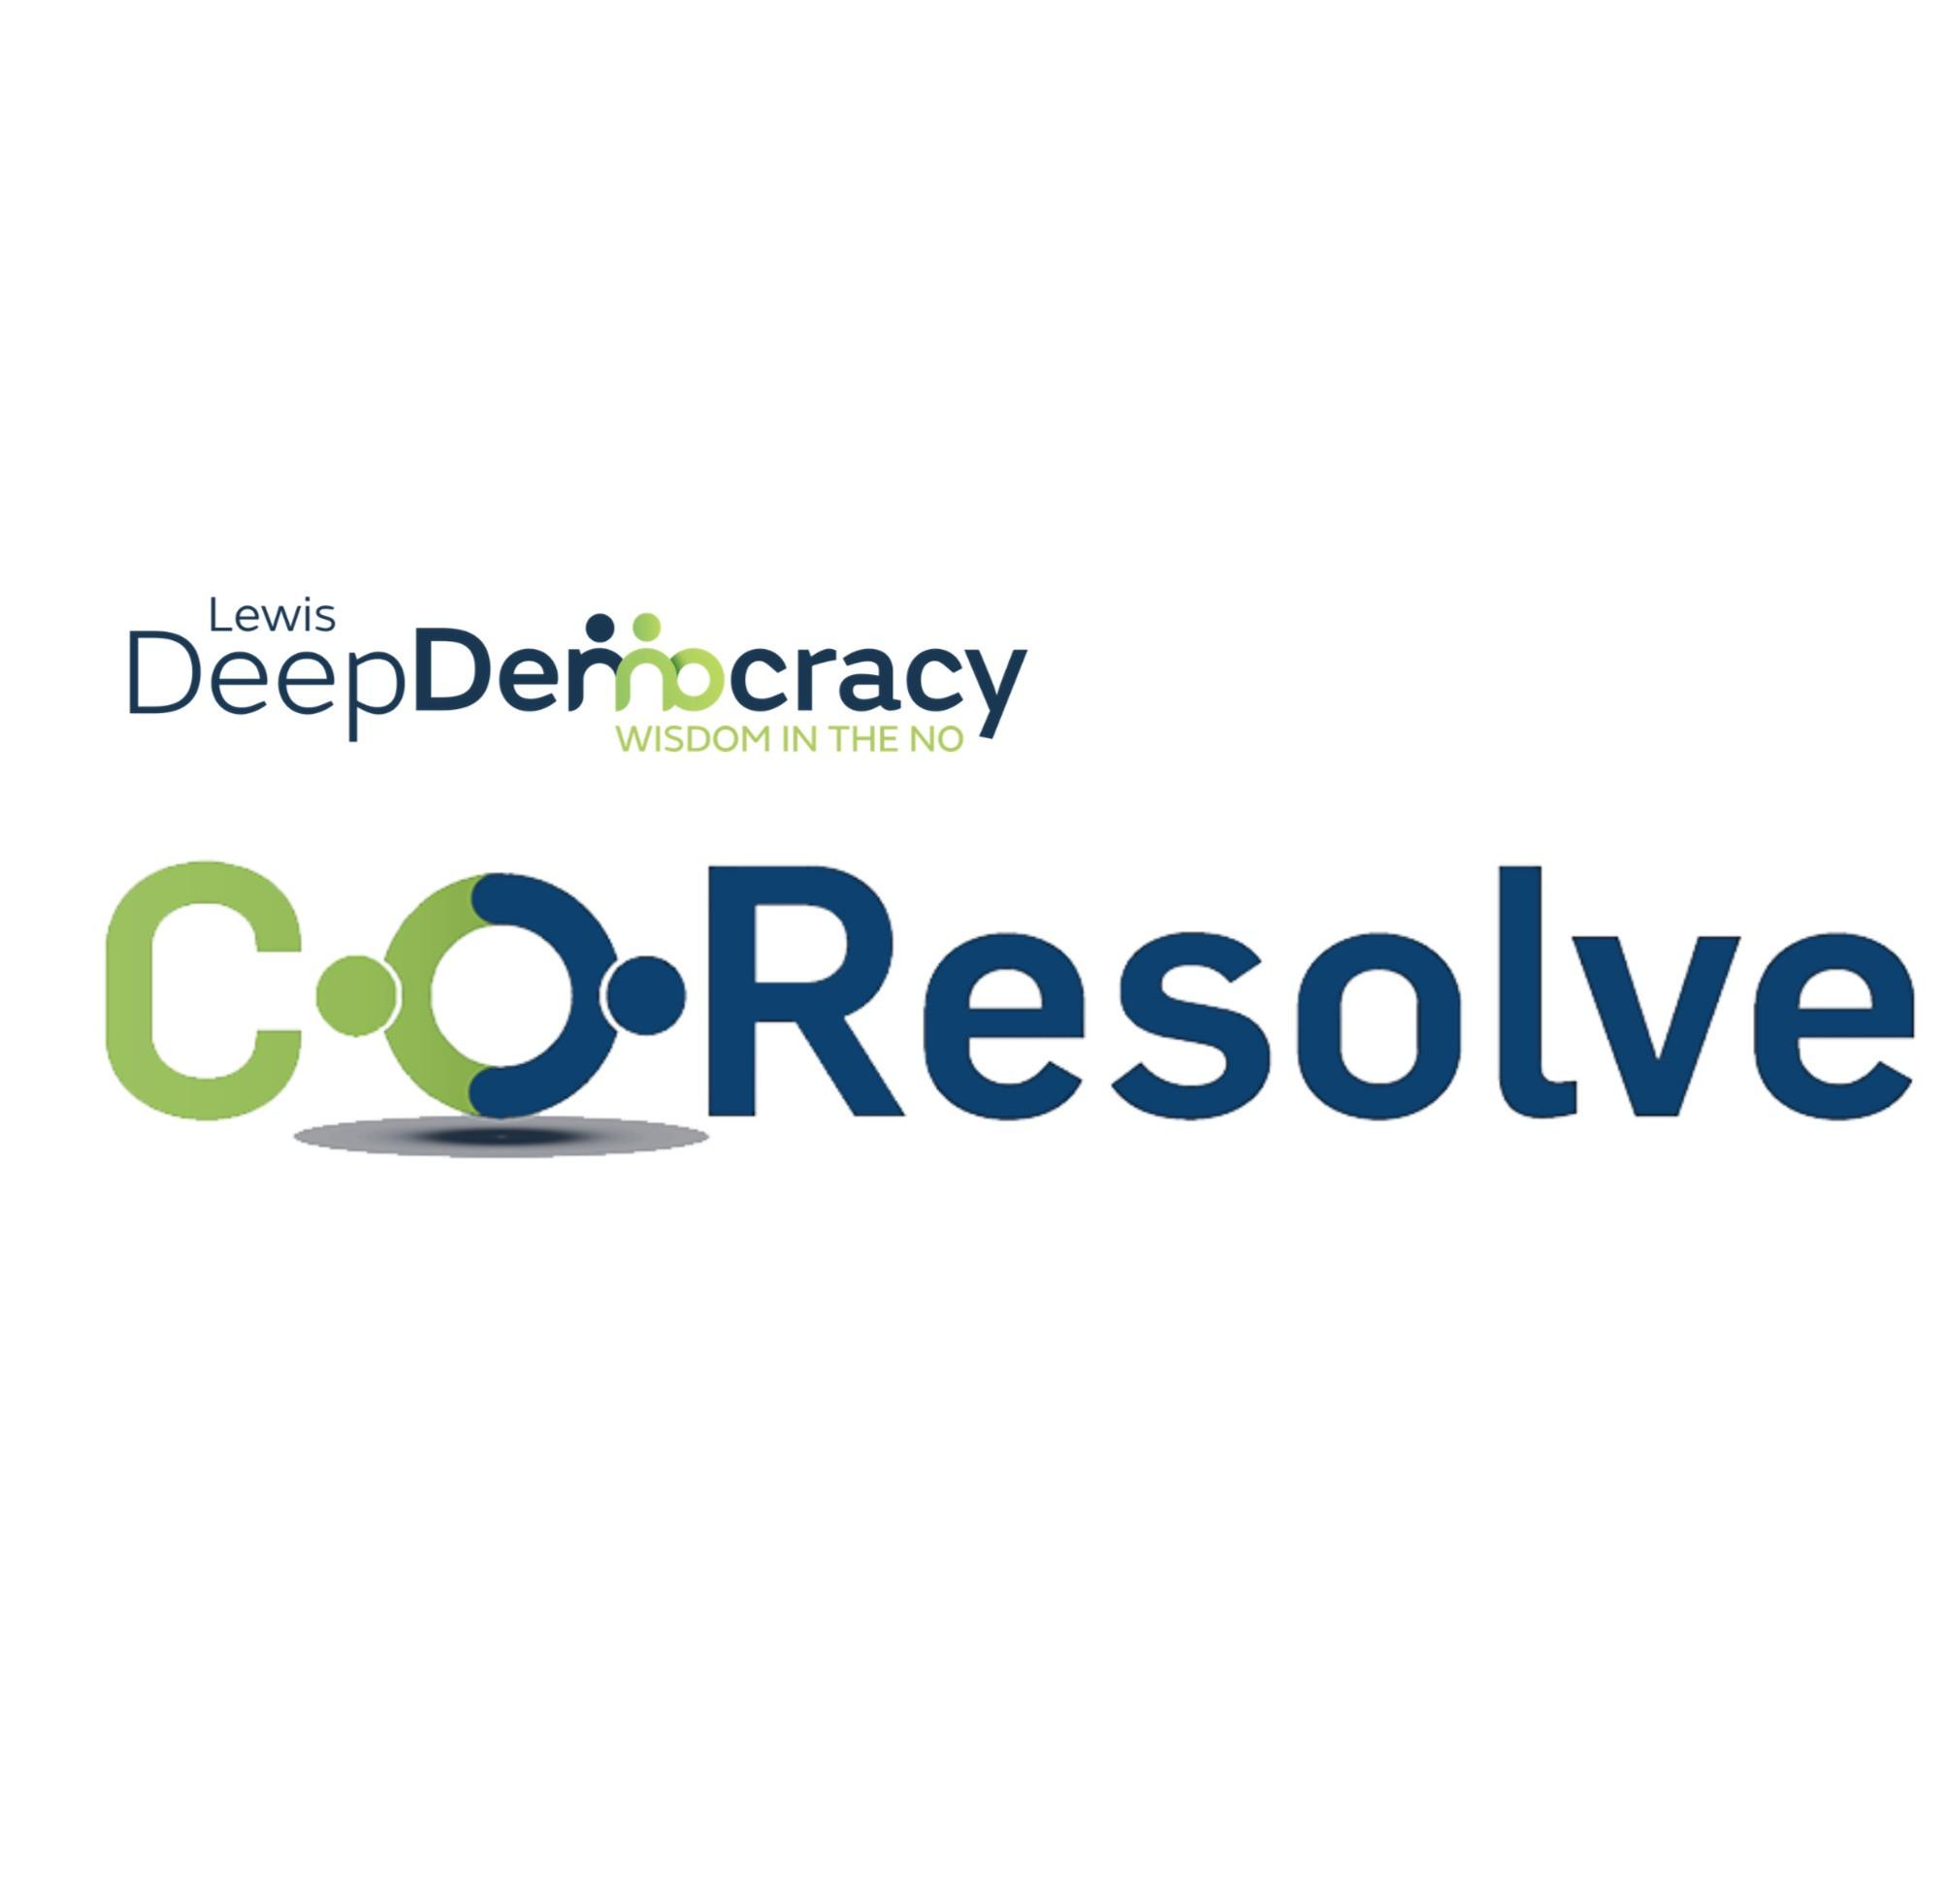 Curso Democracia Profunda | CoResolve